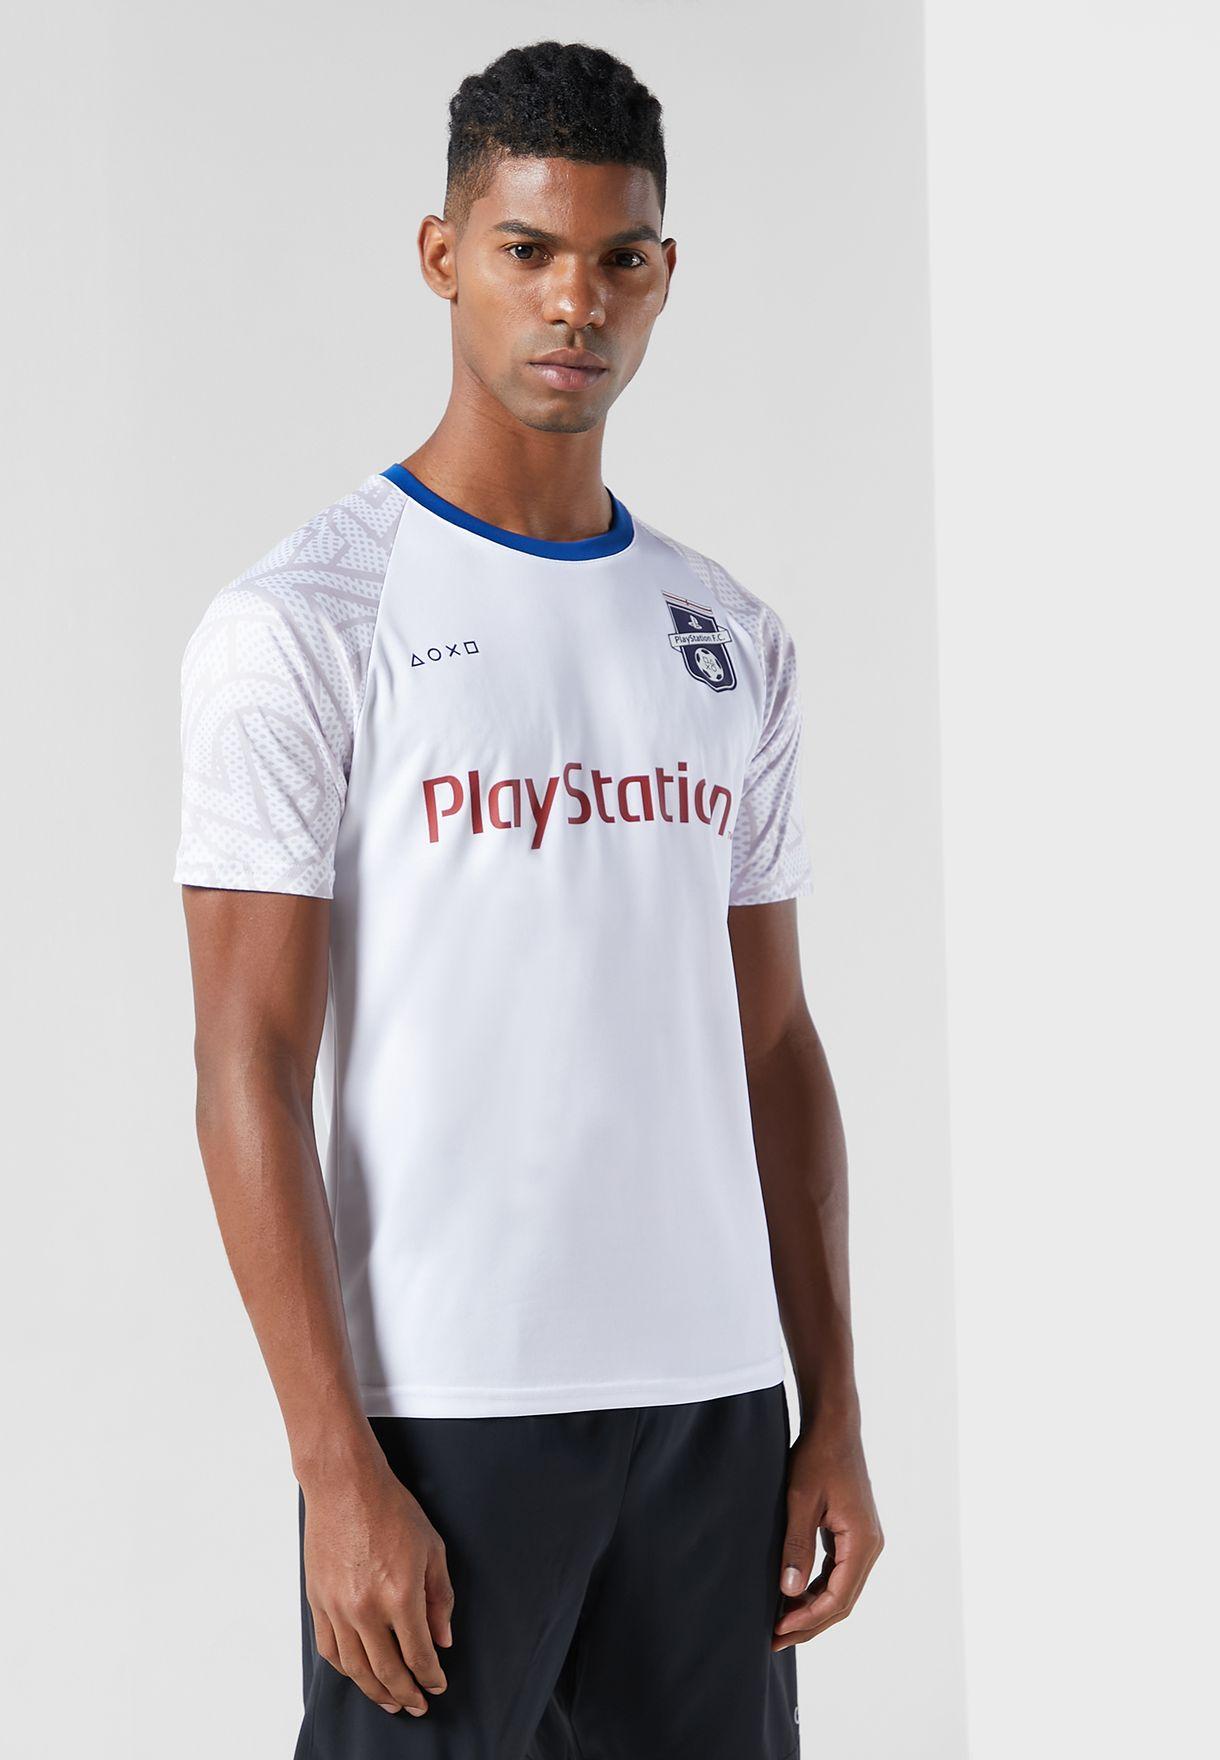 PlayStation England Eu2020 Esports Crew Neck T-Shirt